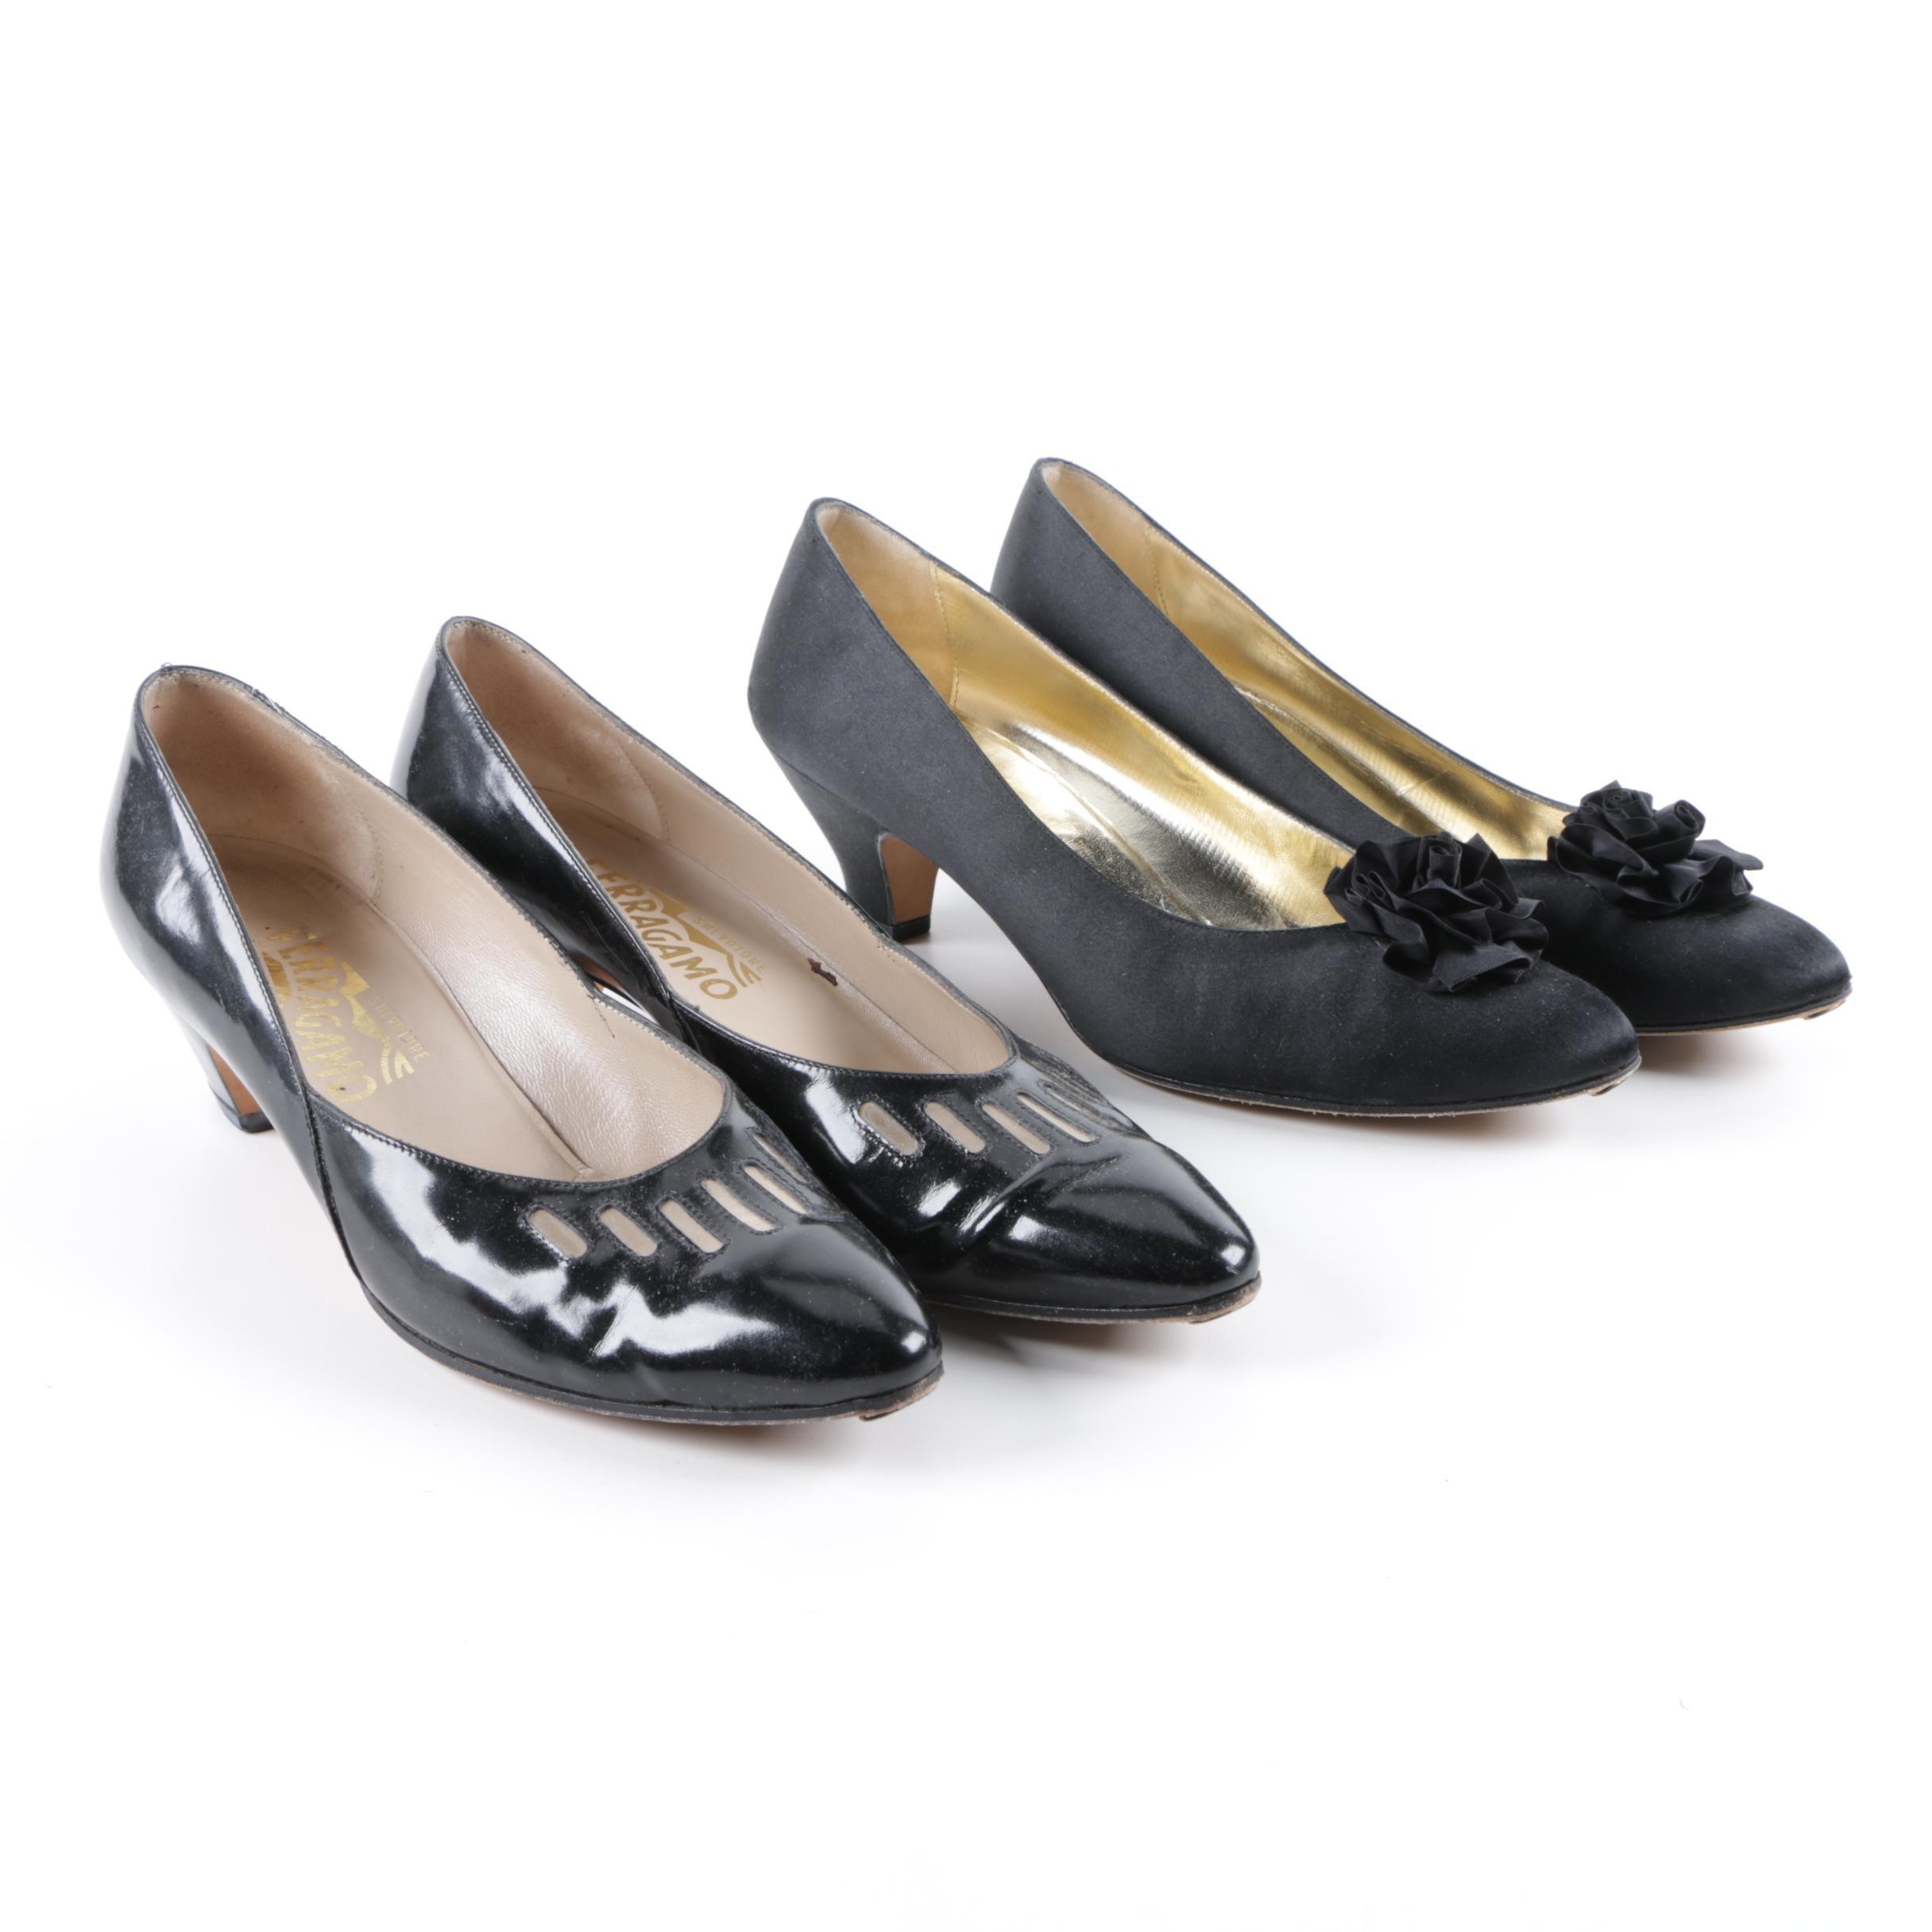 Women's Salvatore Ferragamo Patent Leather and Satin Shoes